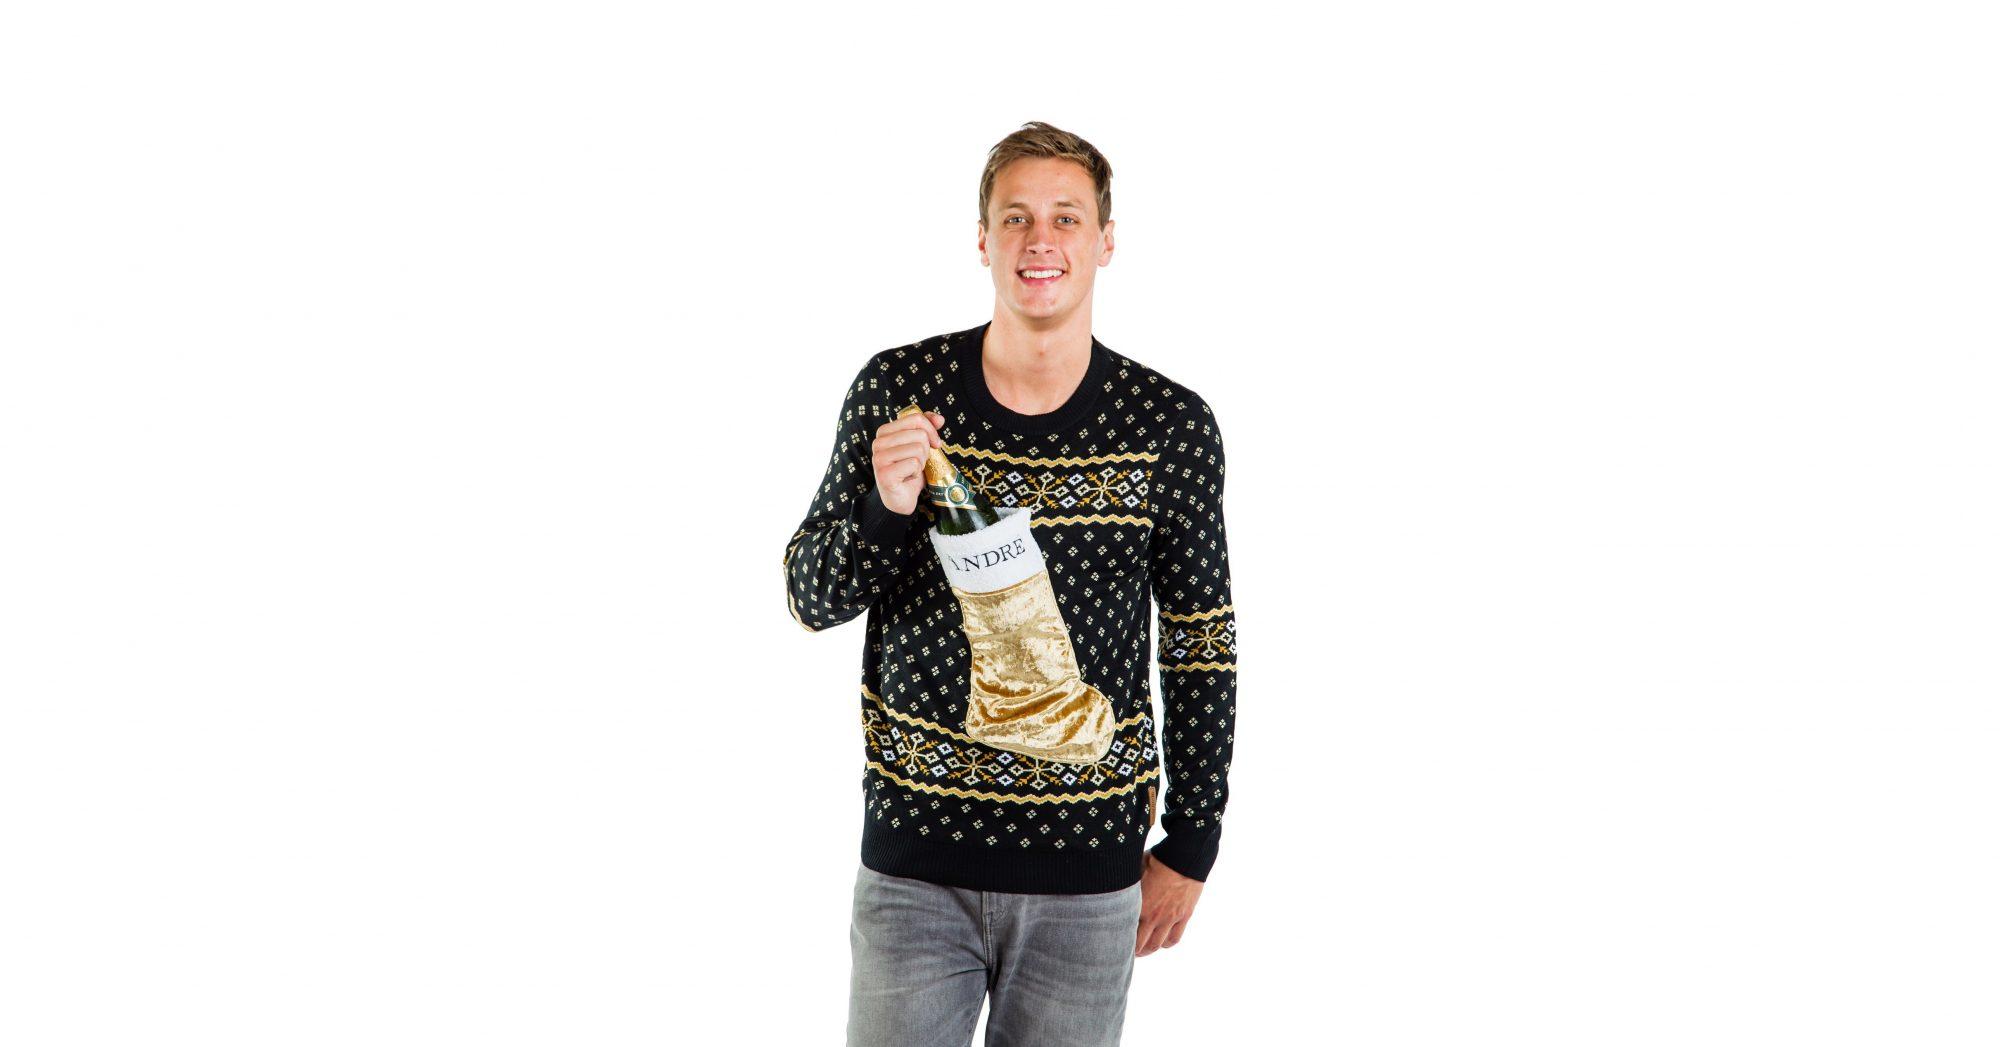 andre-sweater.jpeg